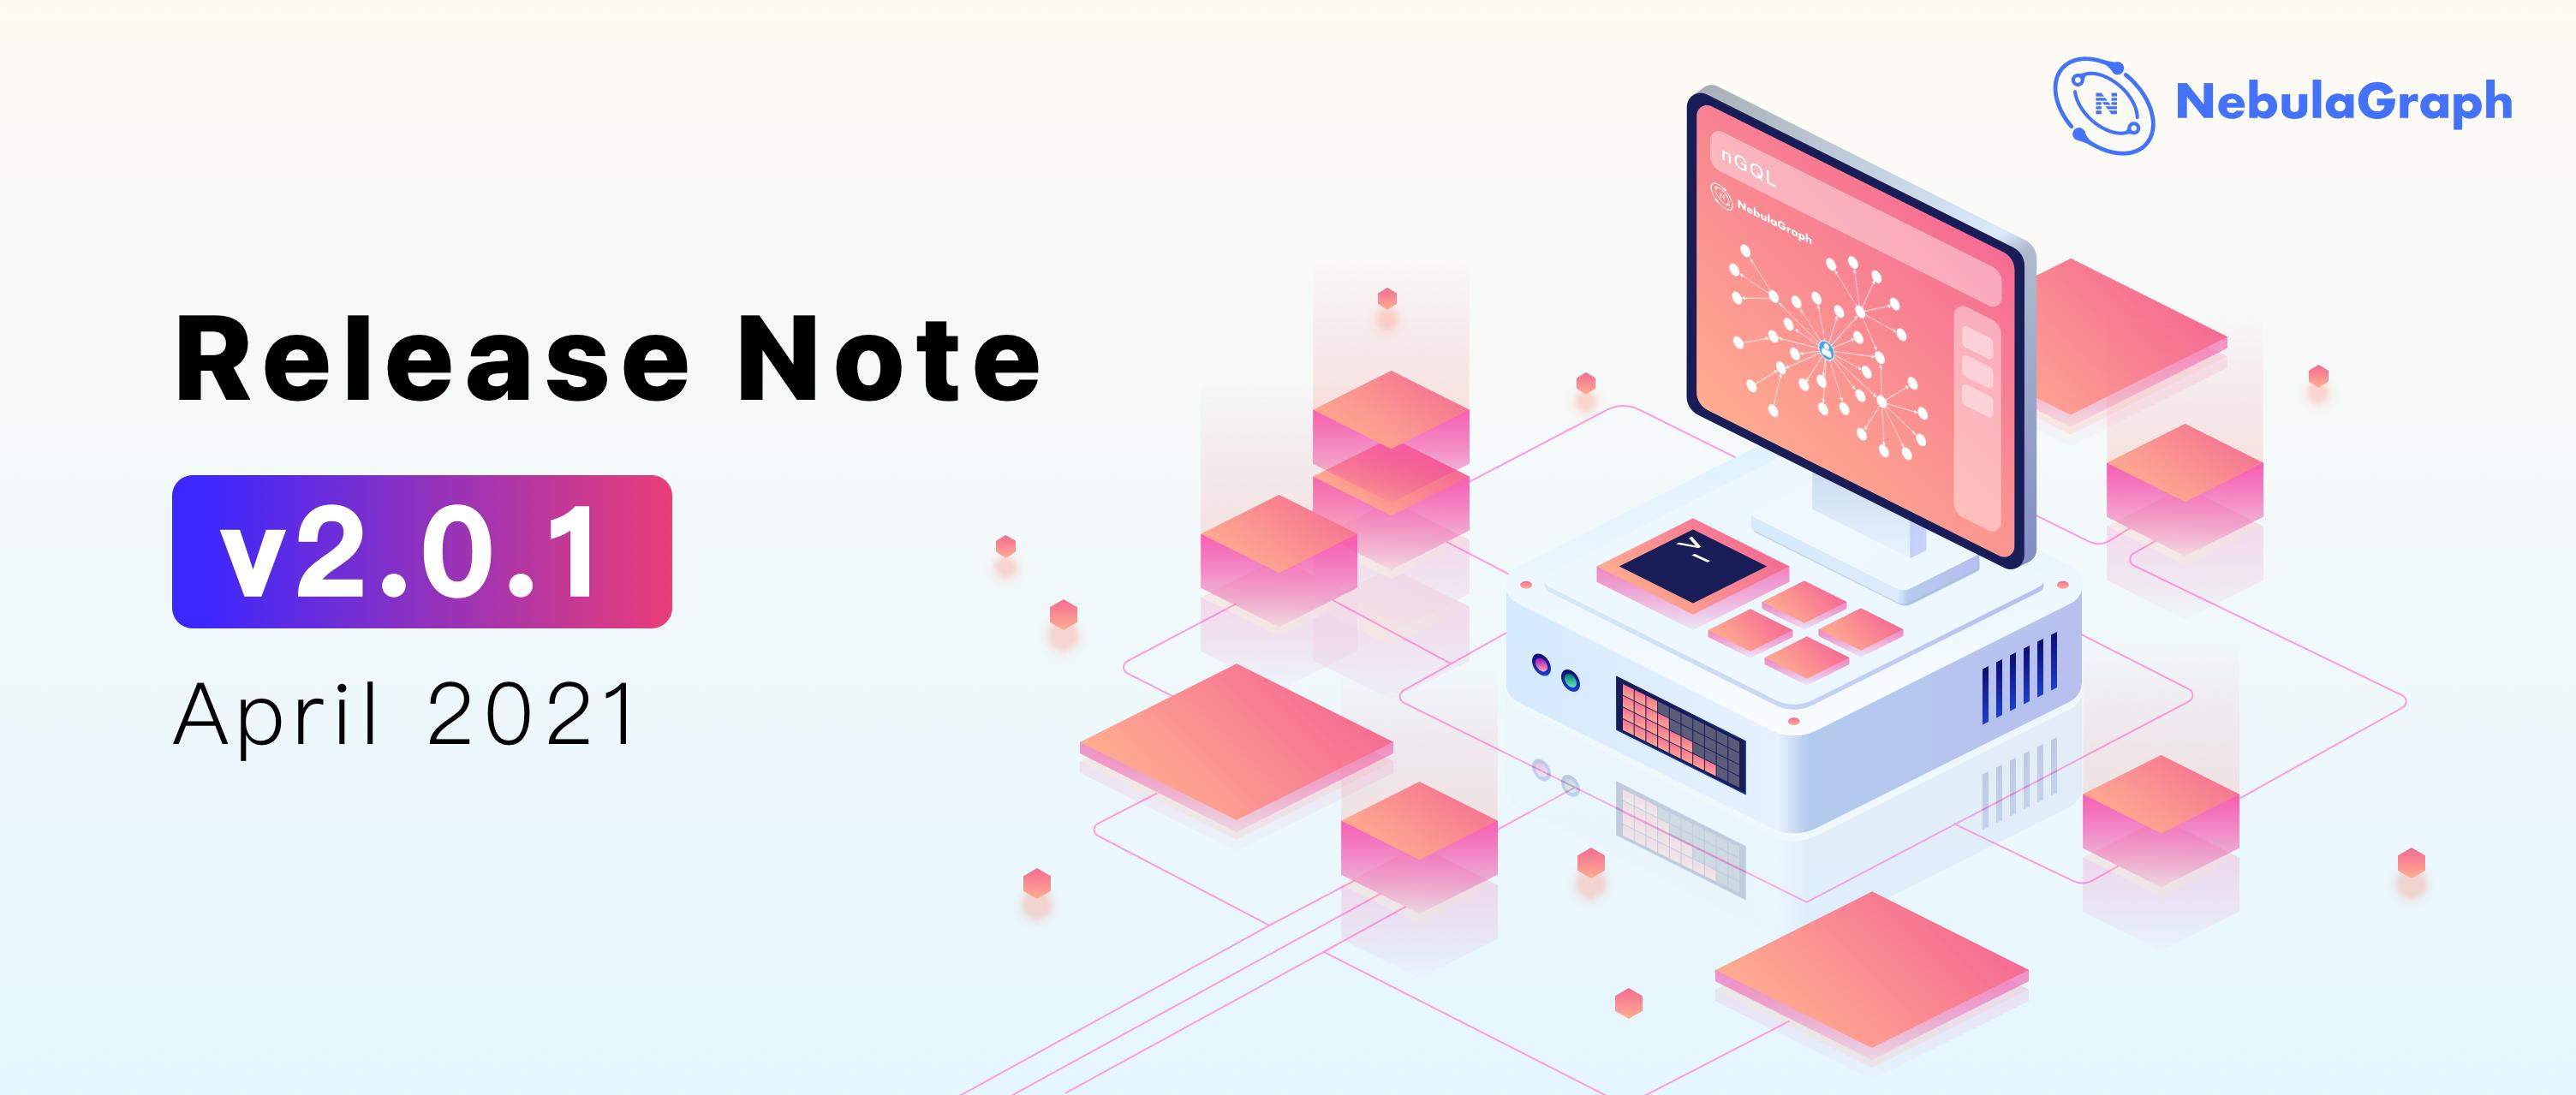 v2.0.1 Release note